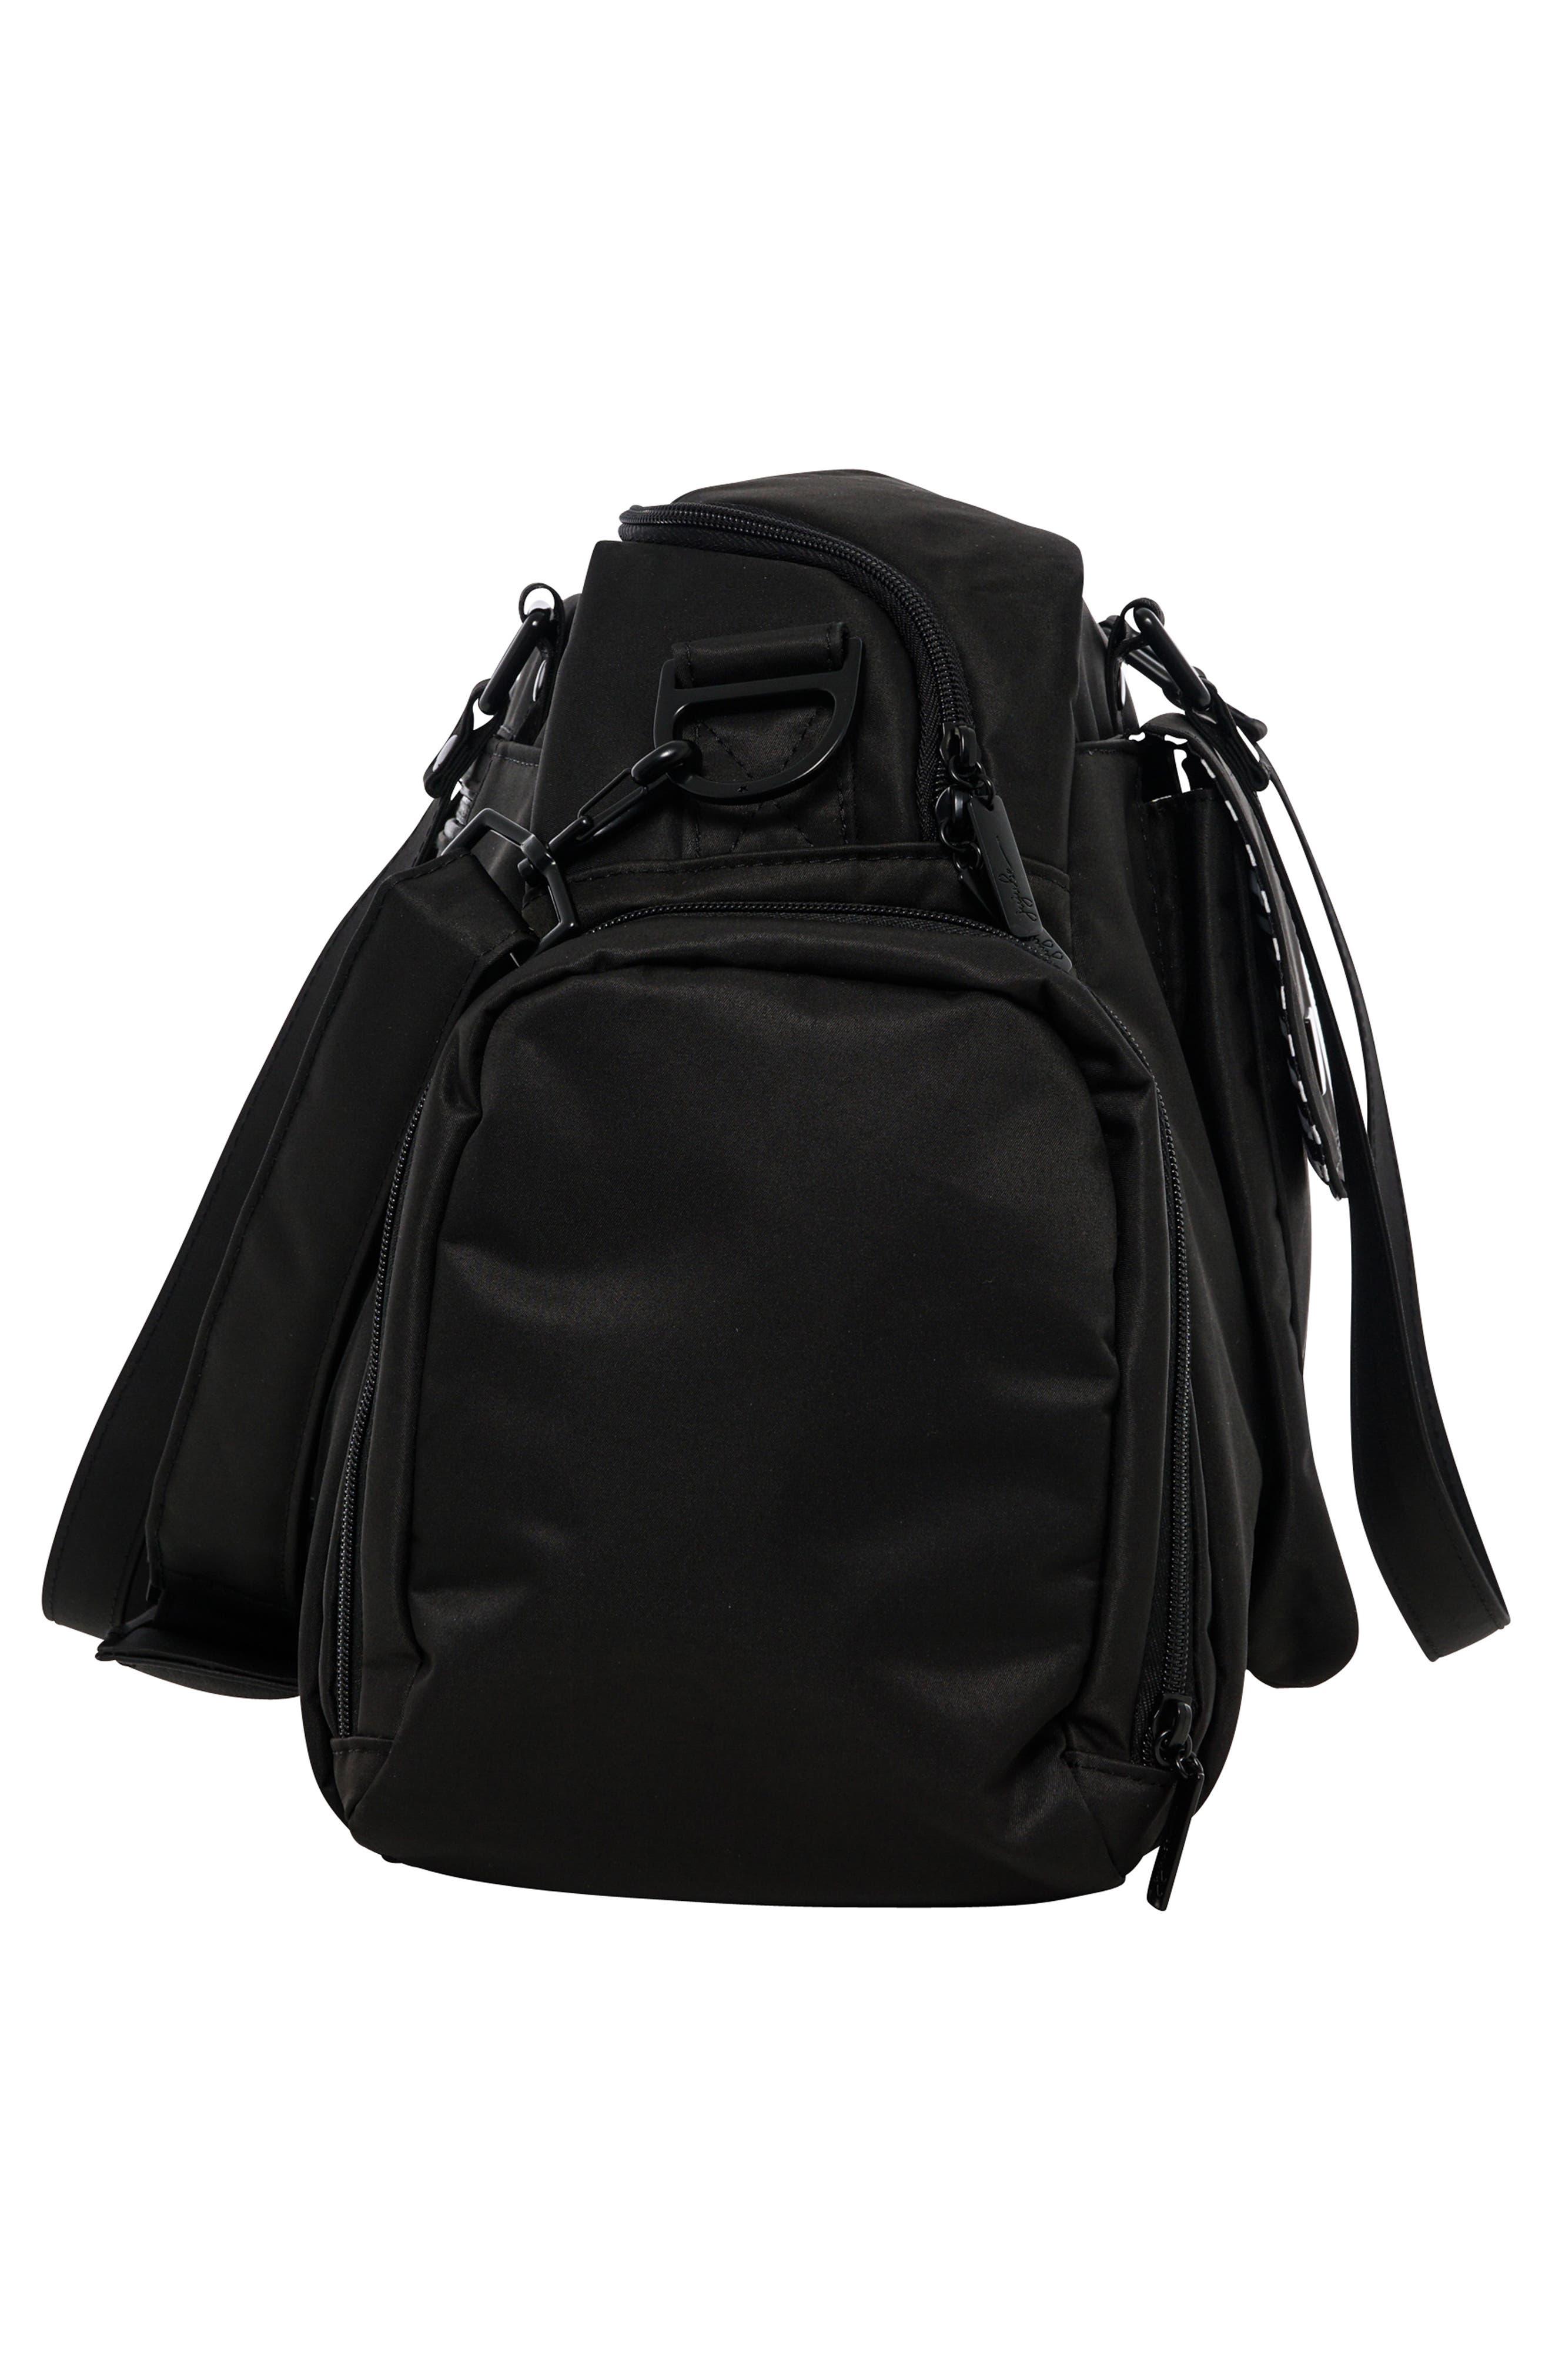 Onyx Be Pumped Bag,                             Alternate thumbnail 4, color,                             001